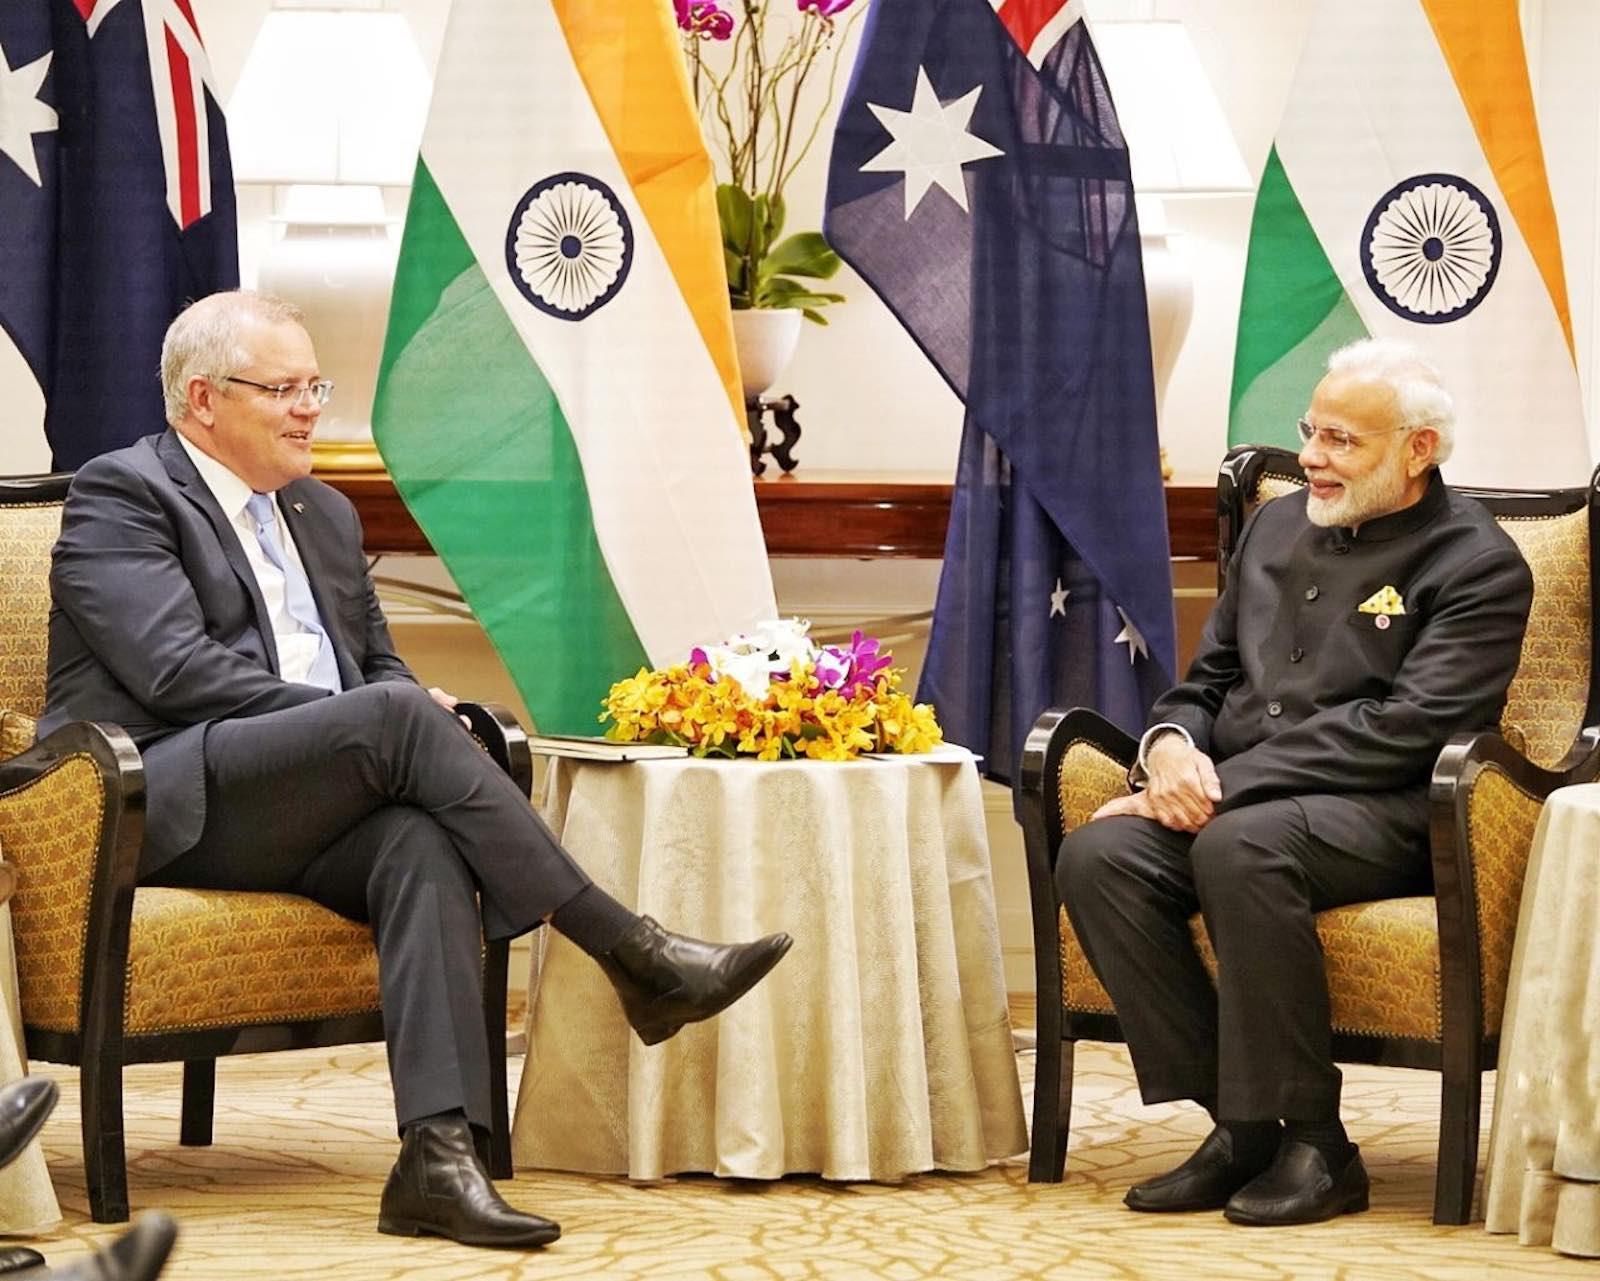 Prime Minister Scott Morrison and India's Prime Minister Narendra Modi (Photo: MEAphotogallery/Flickr)